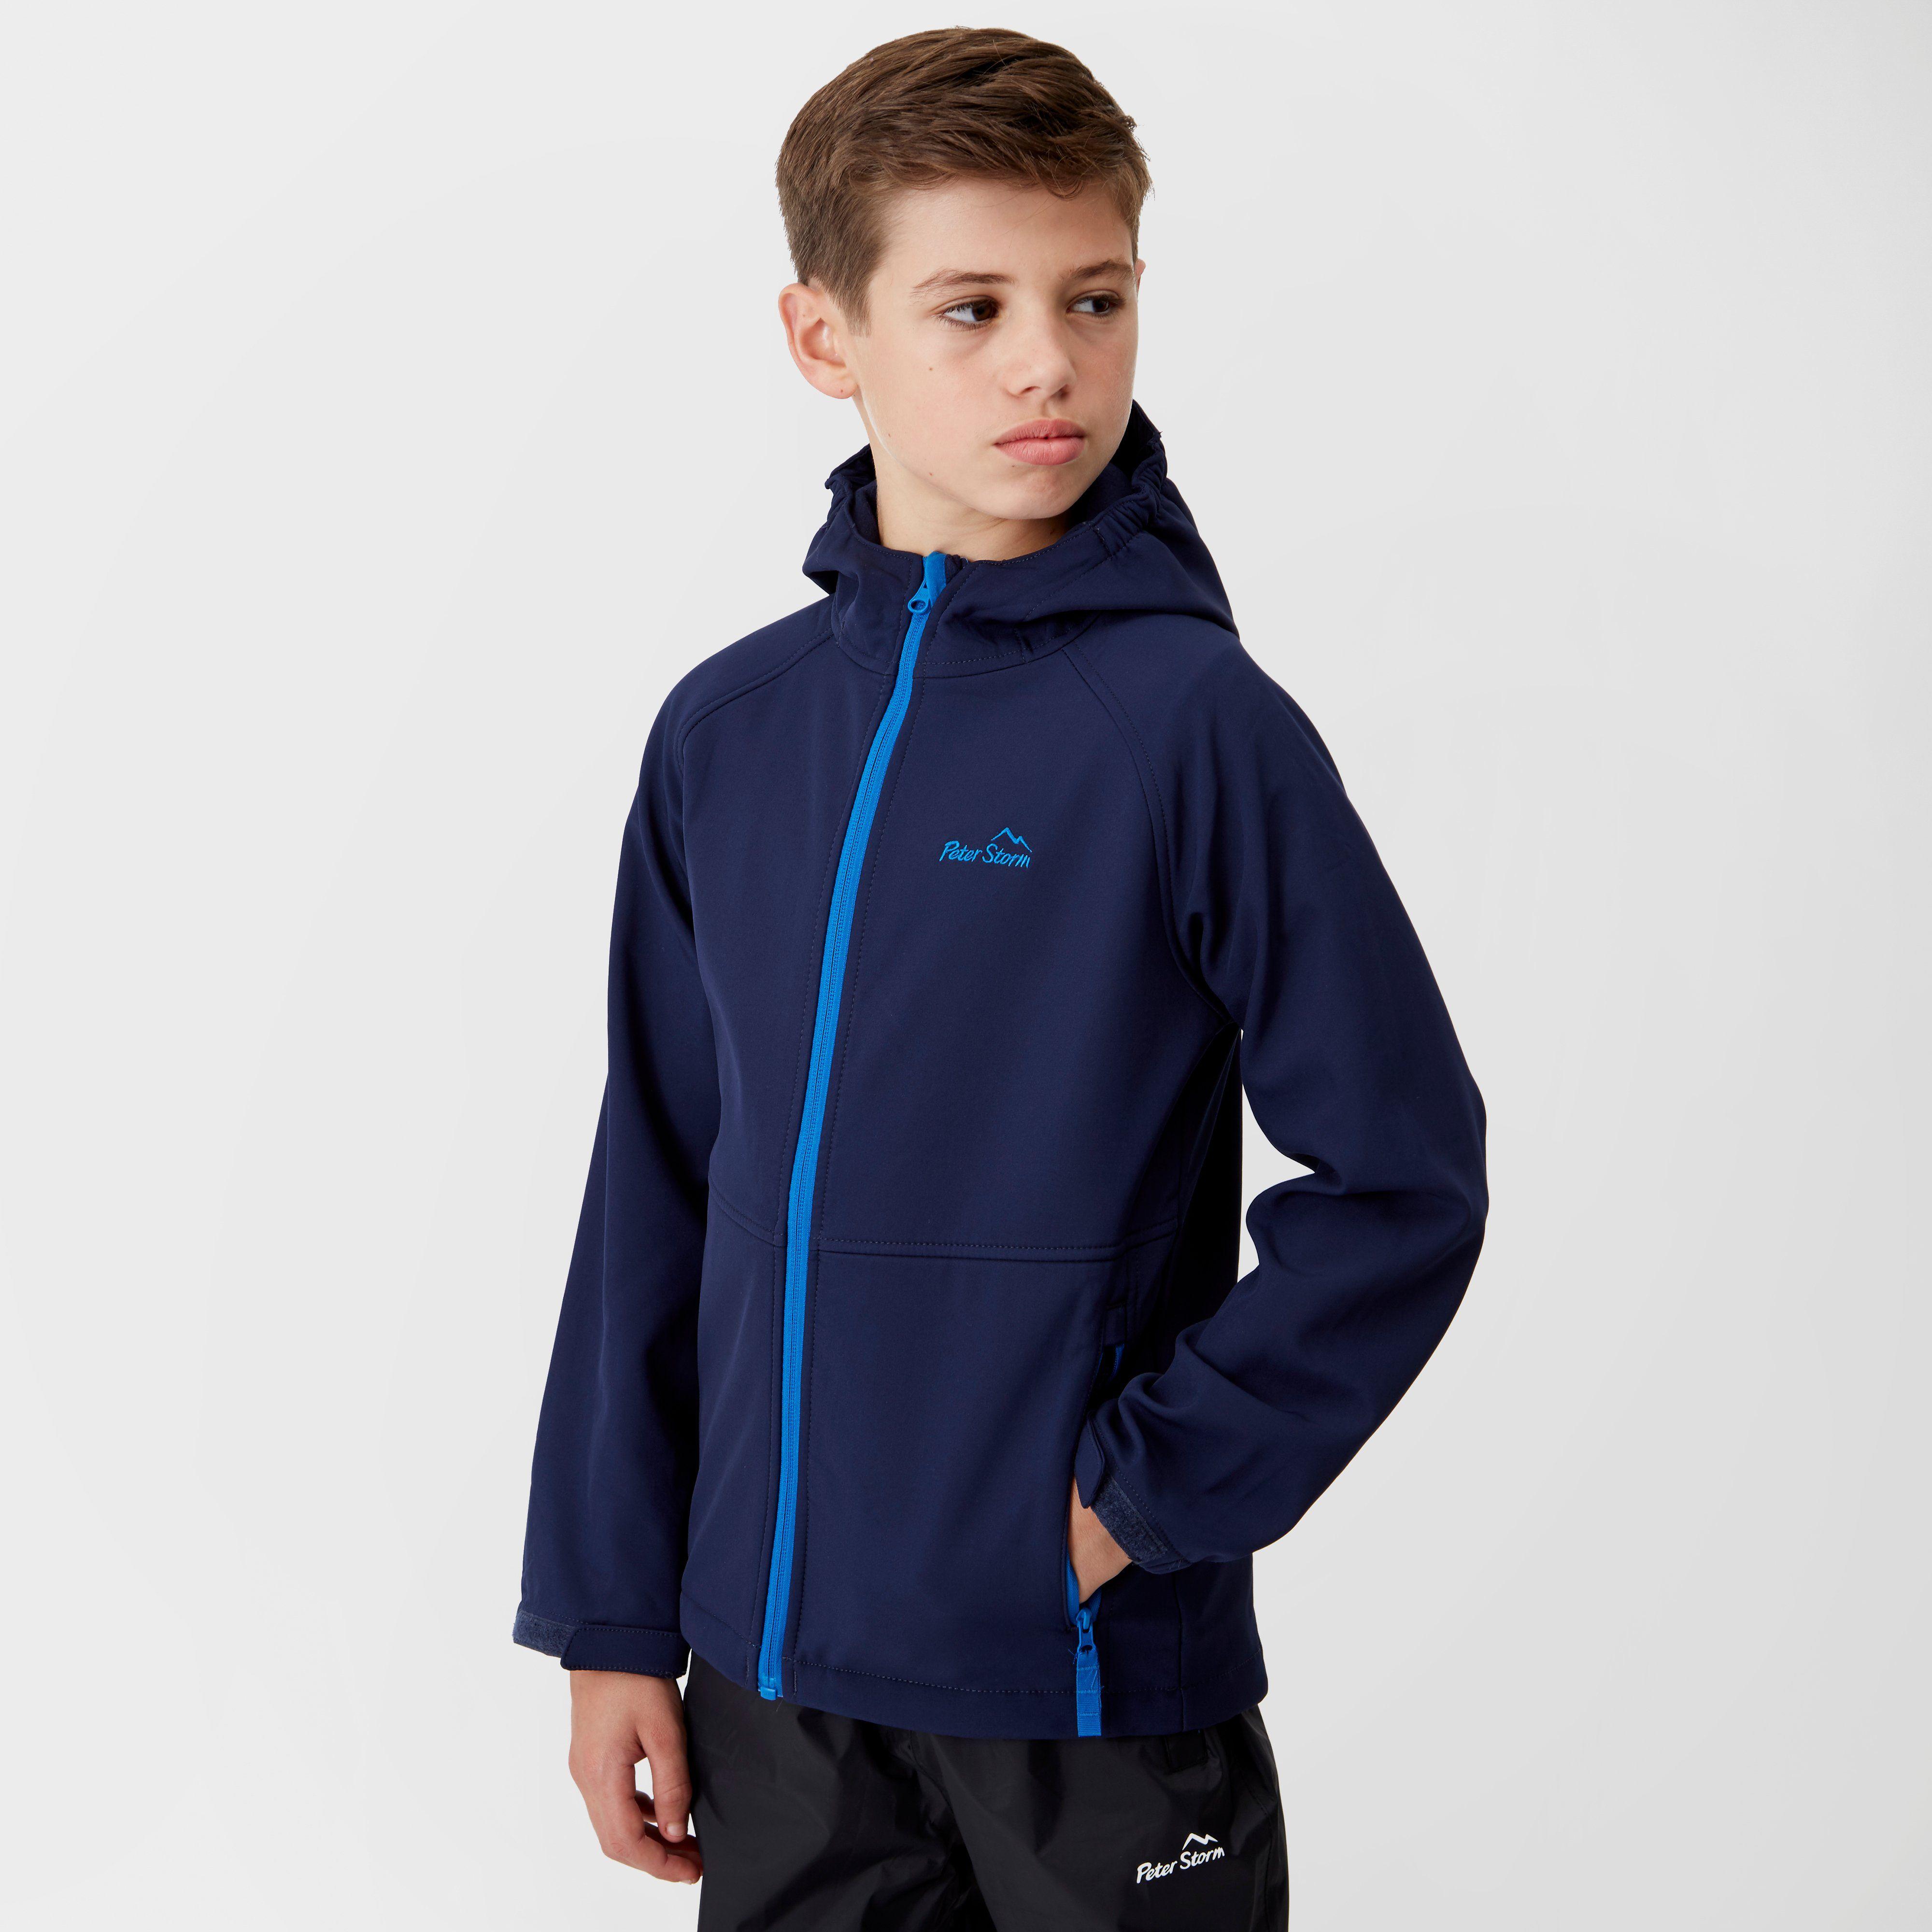 PETER STORM Boy's Seb Softshell Jacket